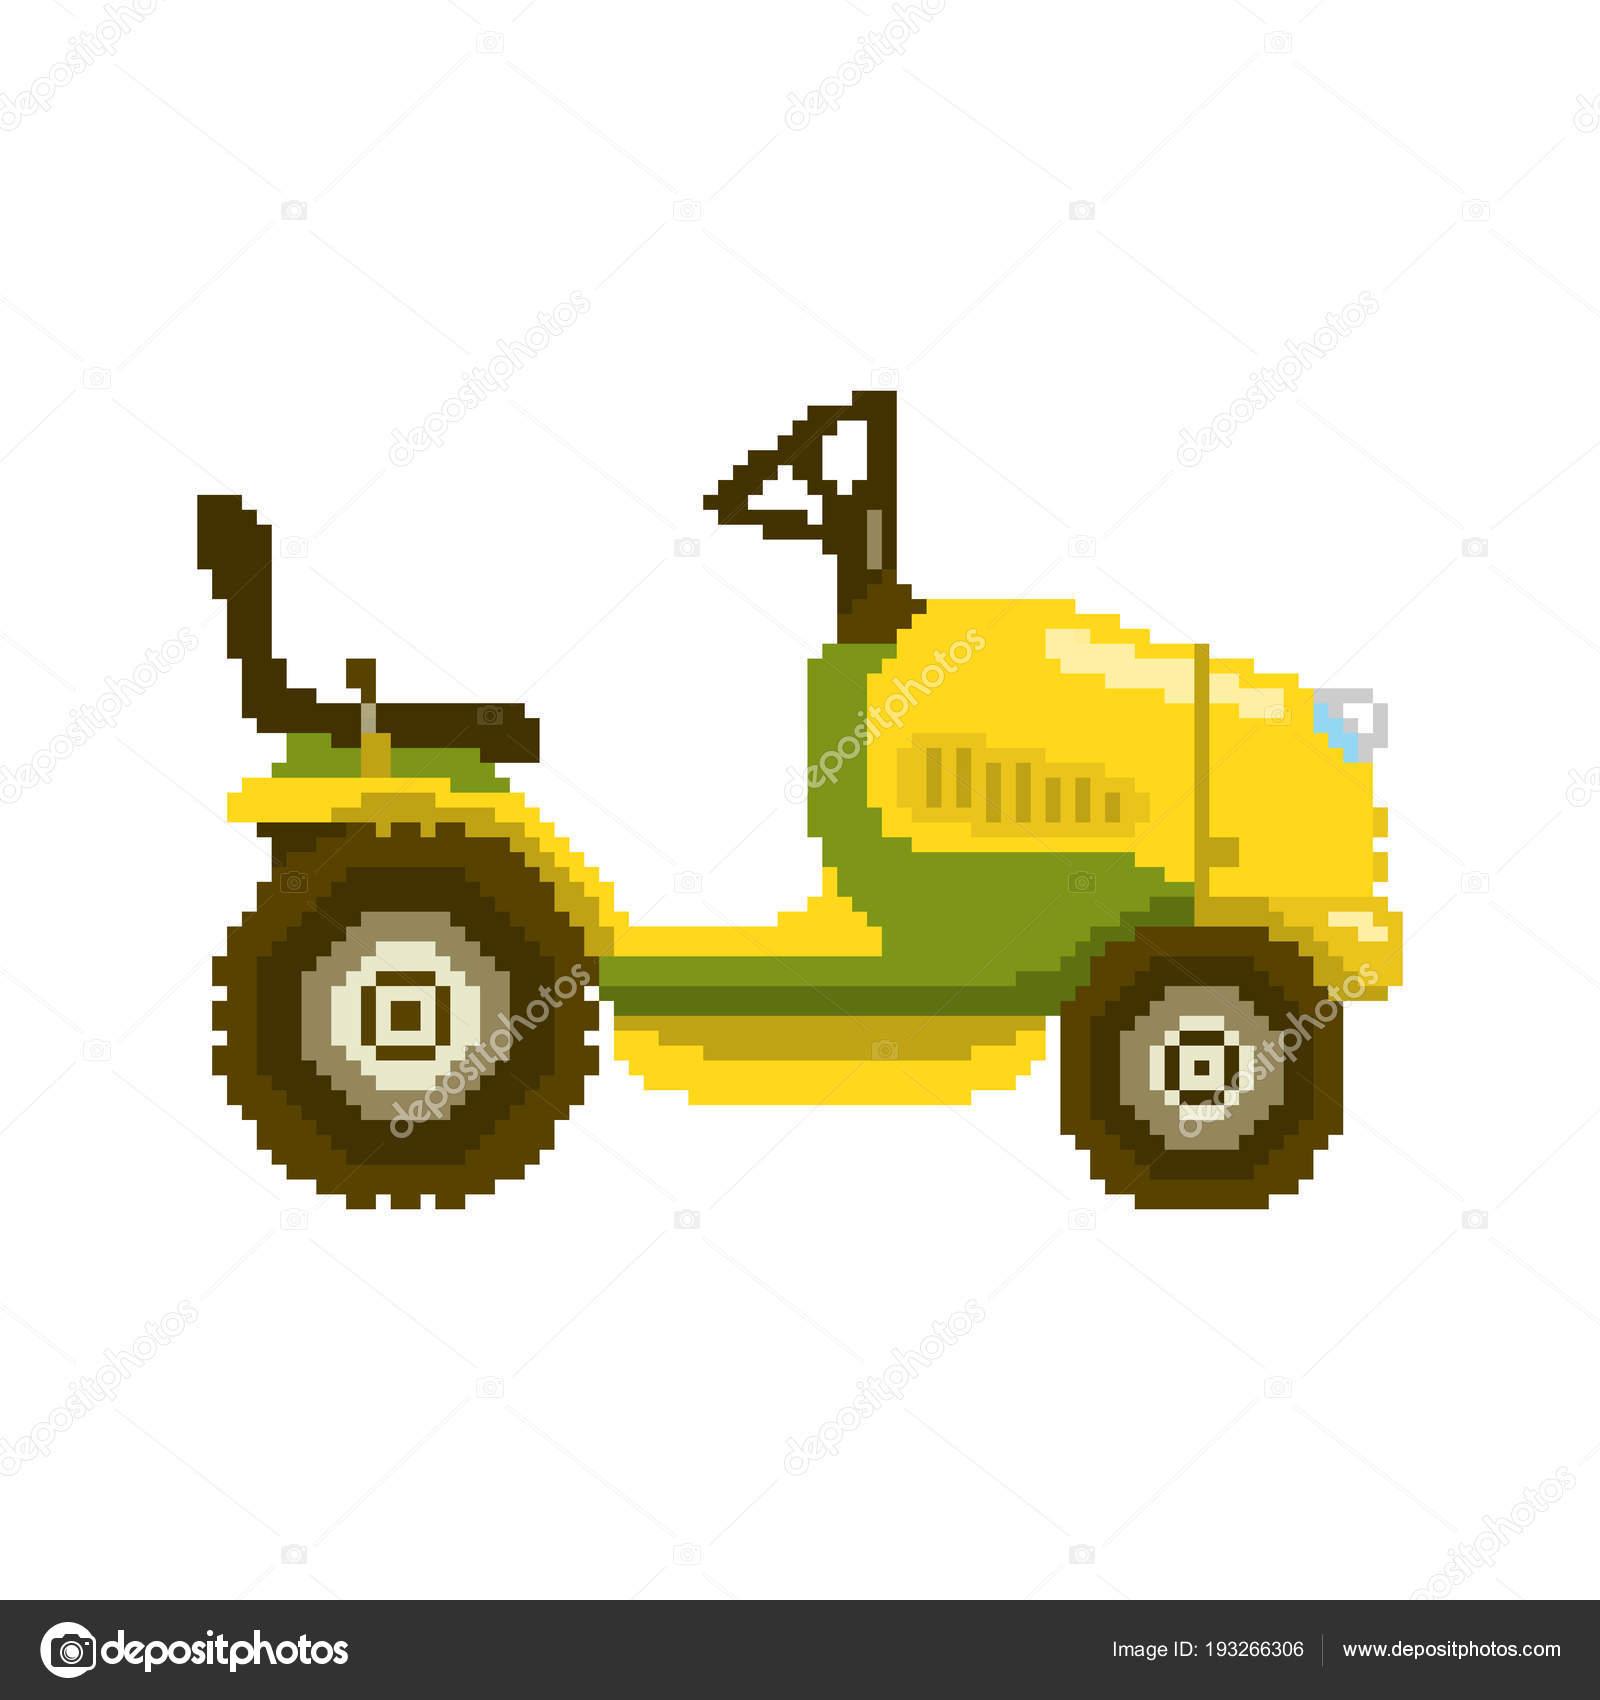 illustration de tracteur de jardin pixel image vectorielle lilkin 193266306. Black Bedroom Furniture Sets. Home Design Ideas